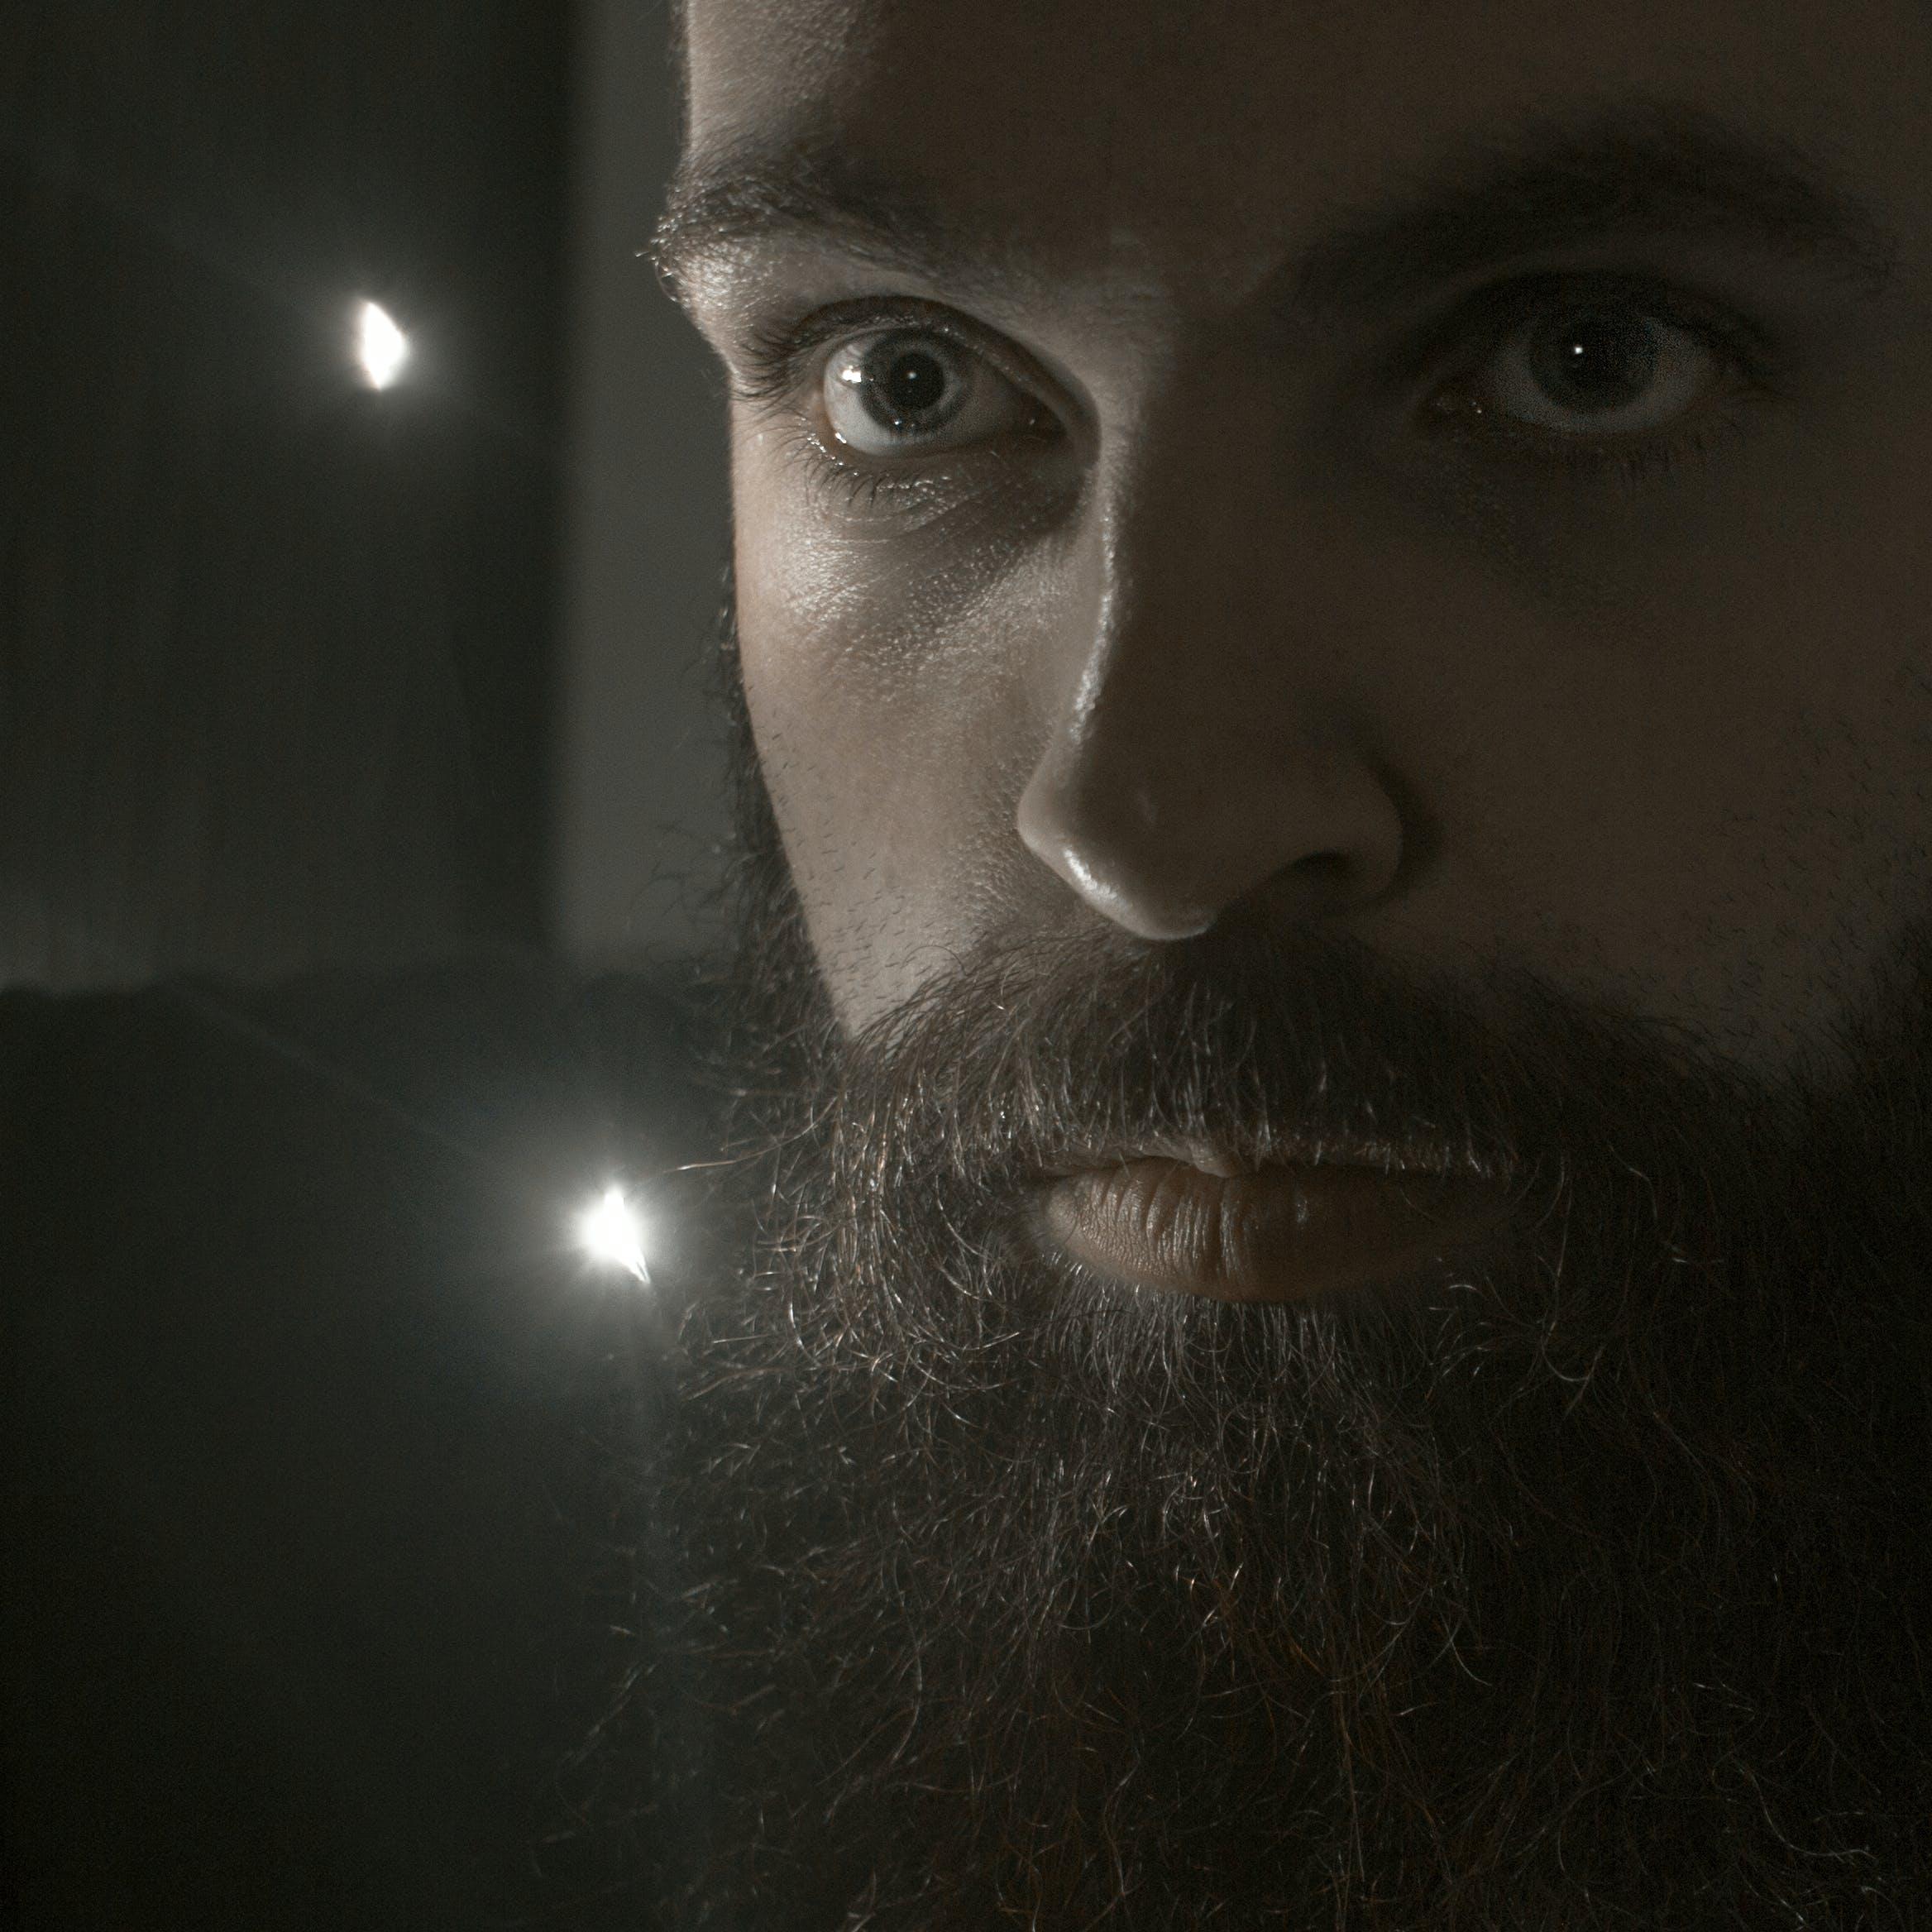 Free stock photo of light, eyes, portrait, fantasy